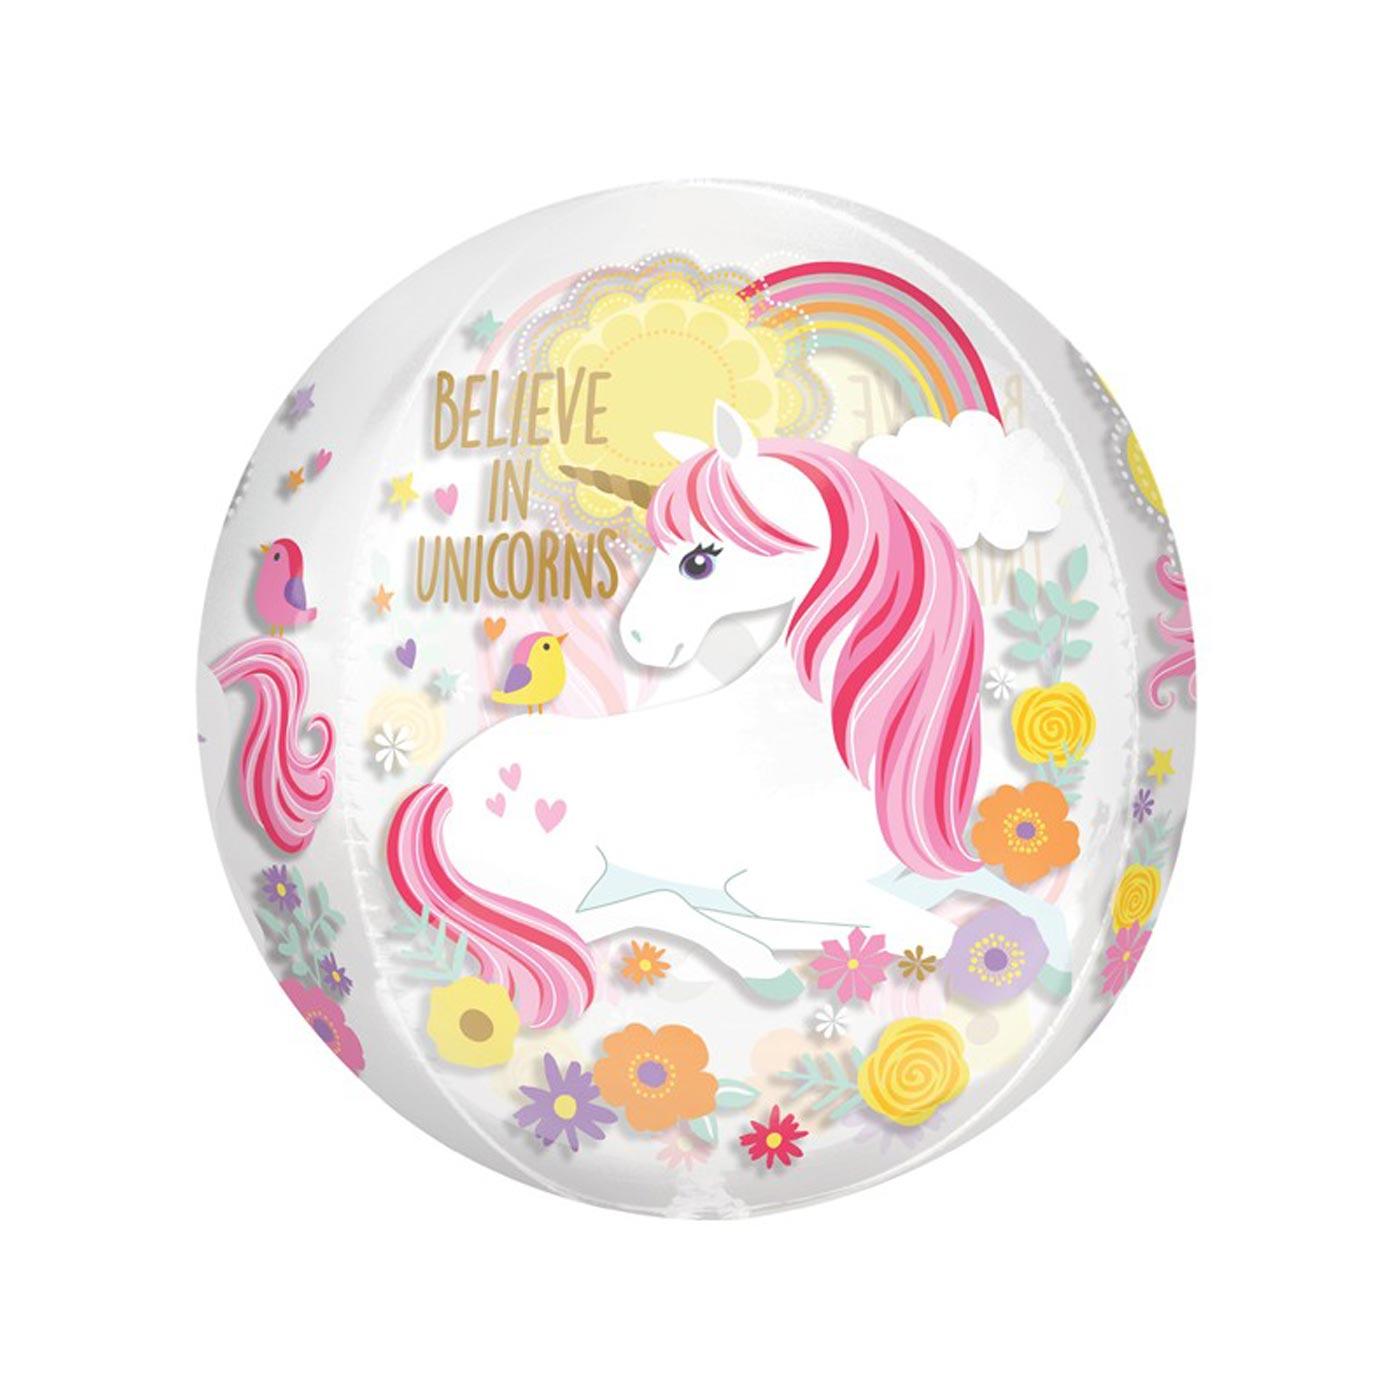 Unicorn Magical Orbz Balloon